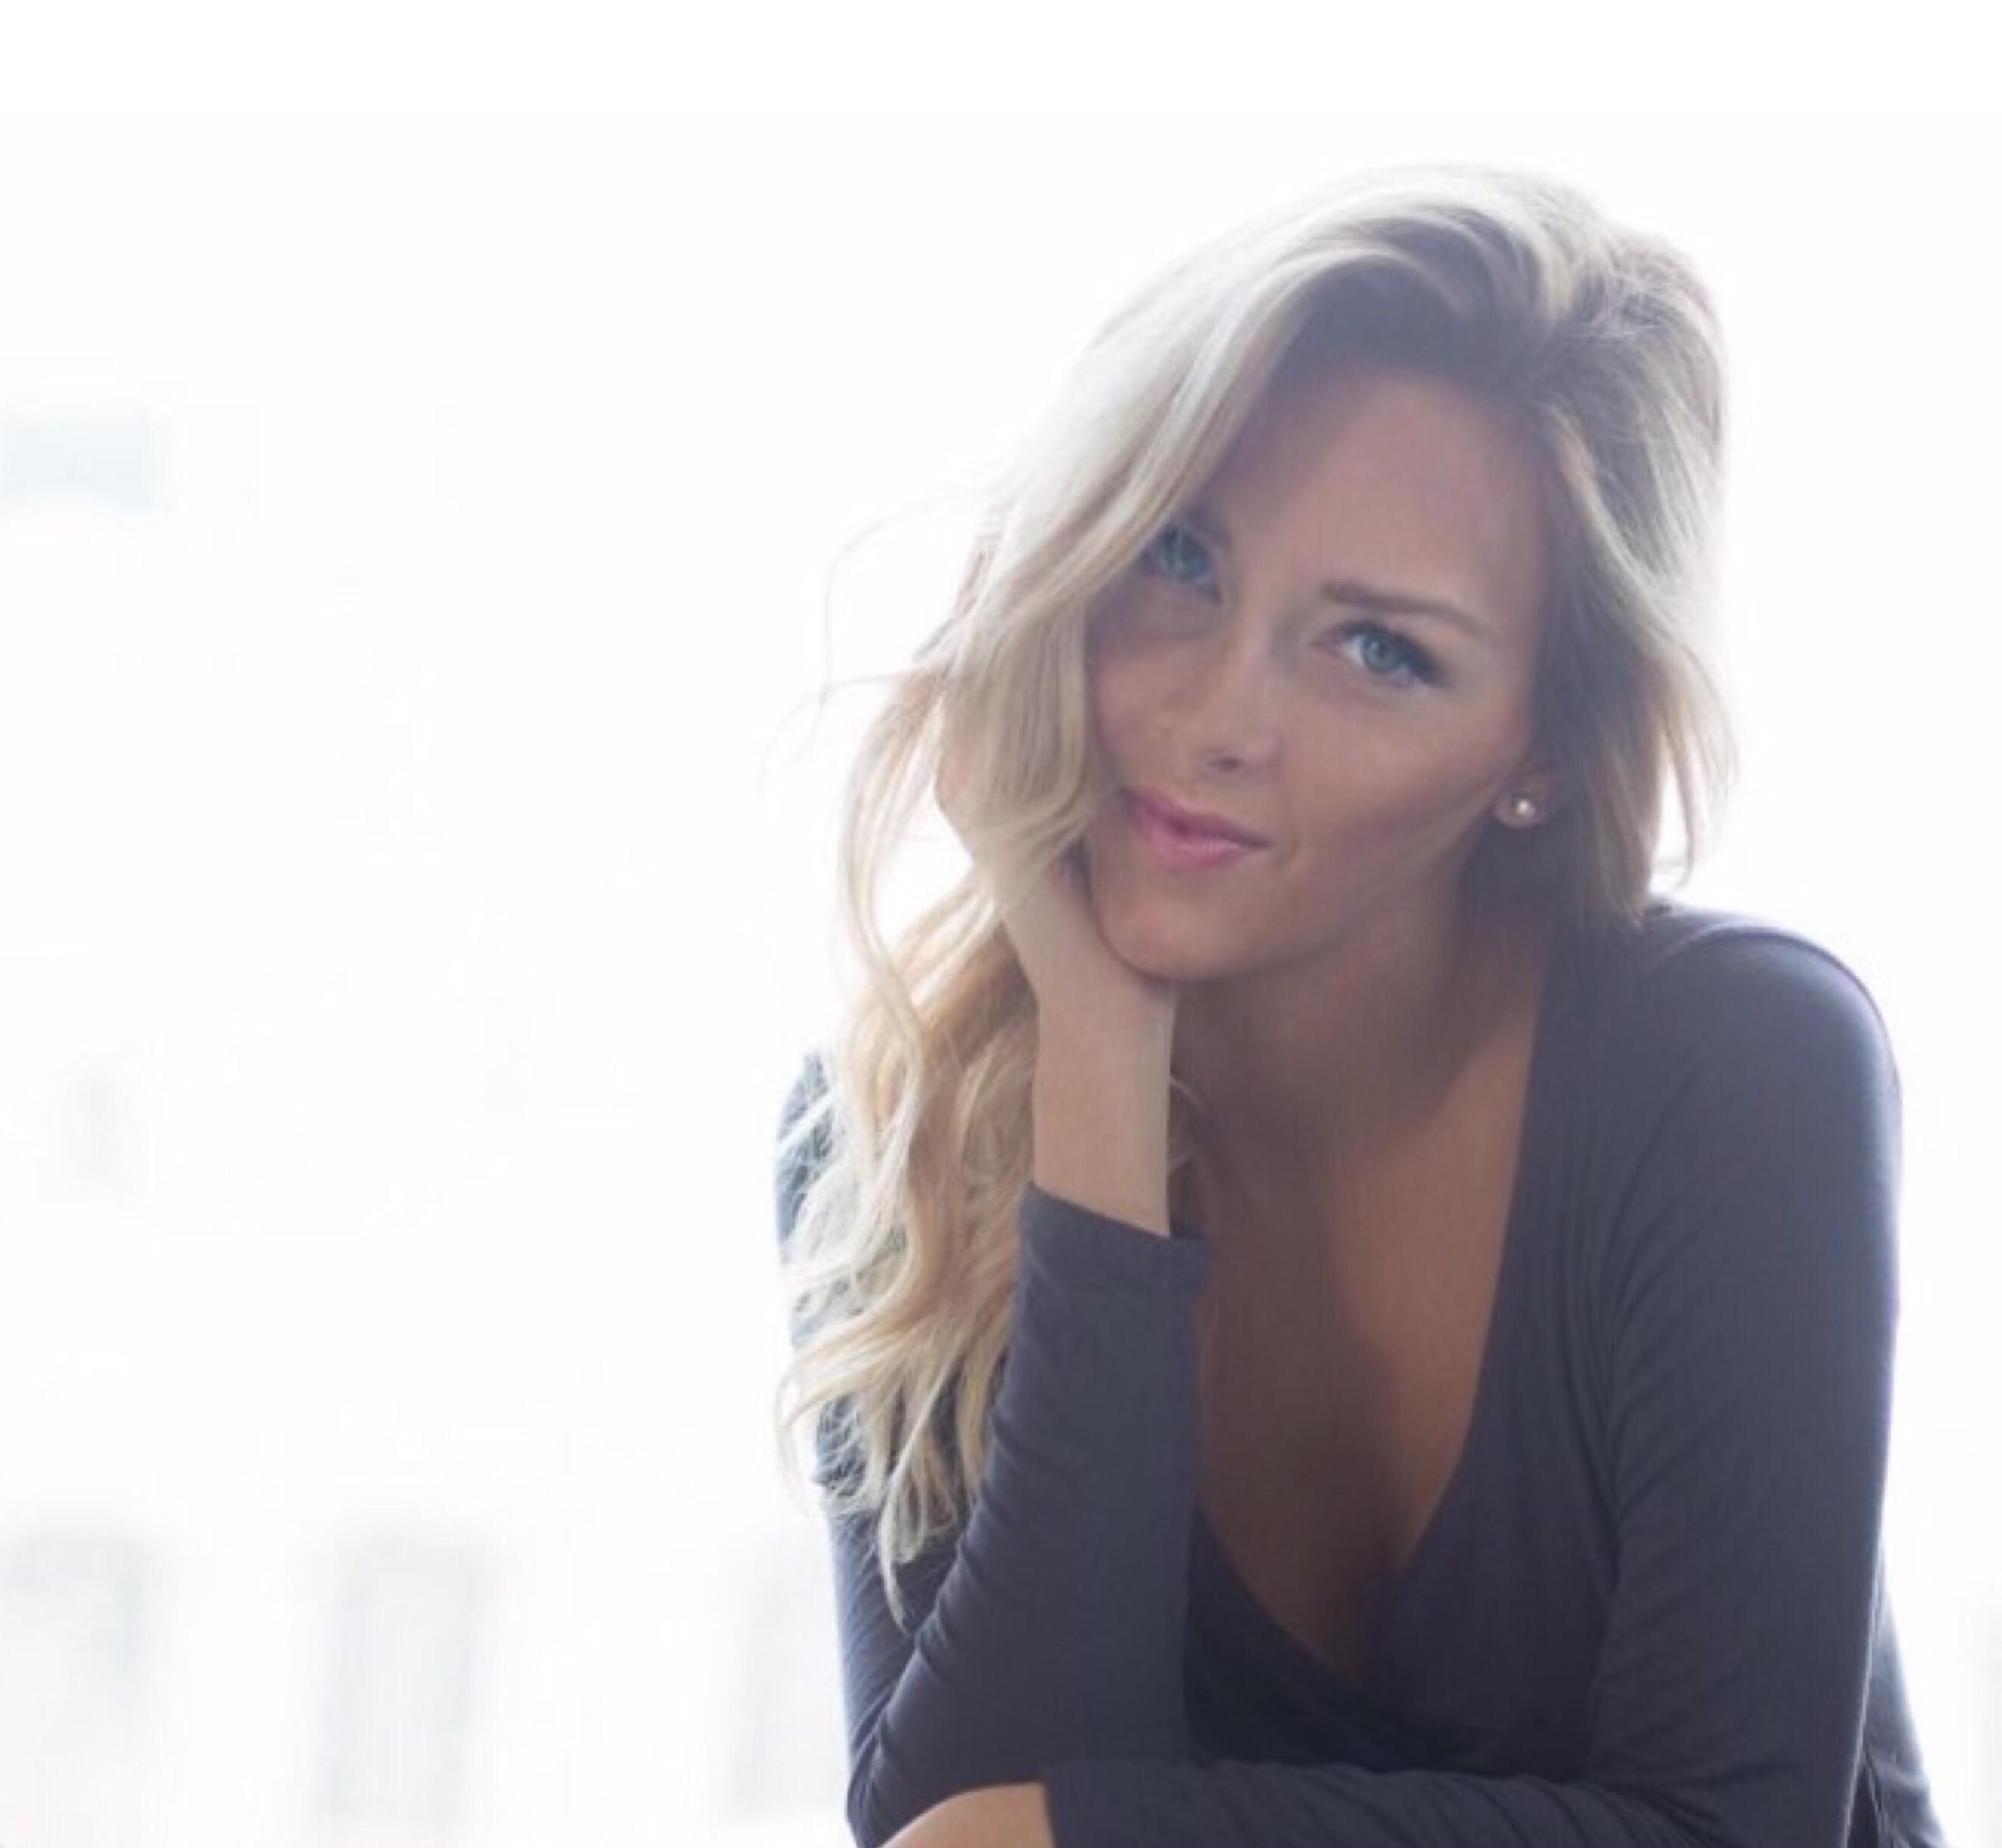 Camille Kostek Latest News: Camille Kostek Joins Dirty Water TV Team